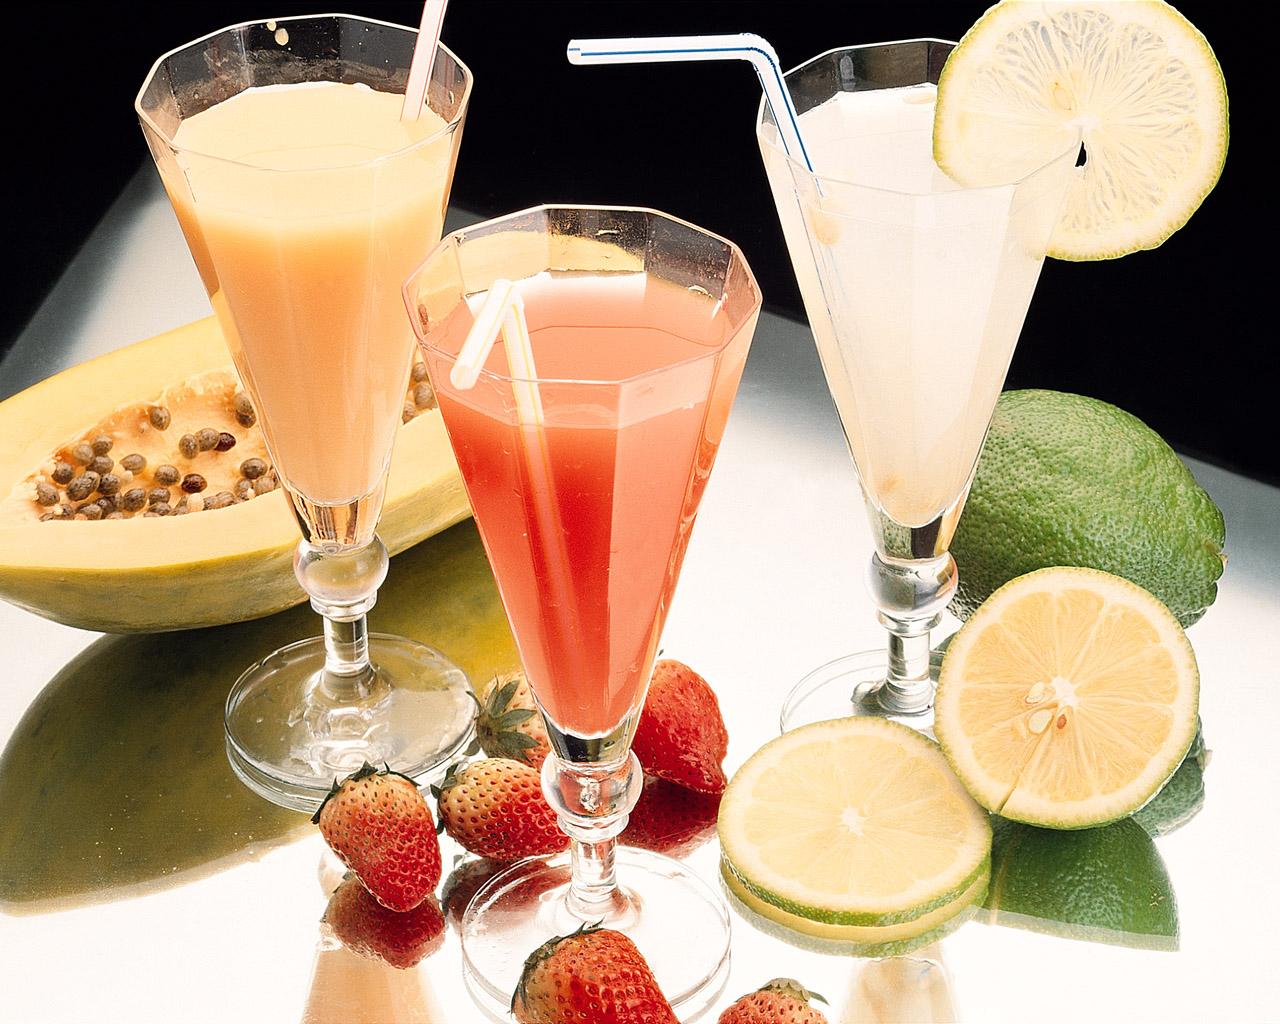 Fooddrinksdrinksfromthejuiceoffreshfruit012902